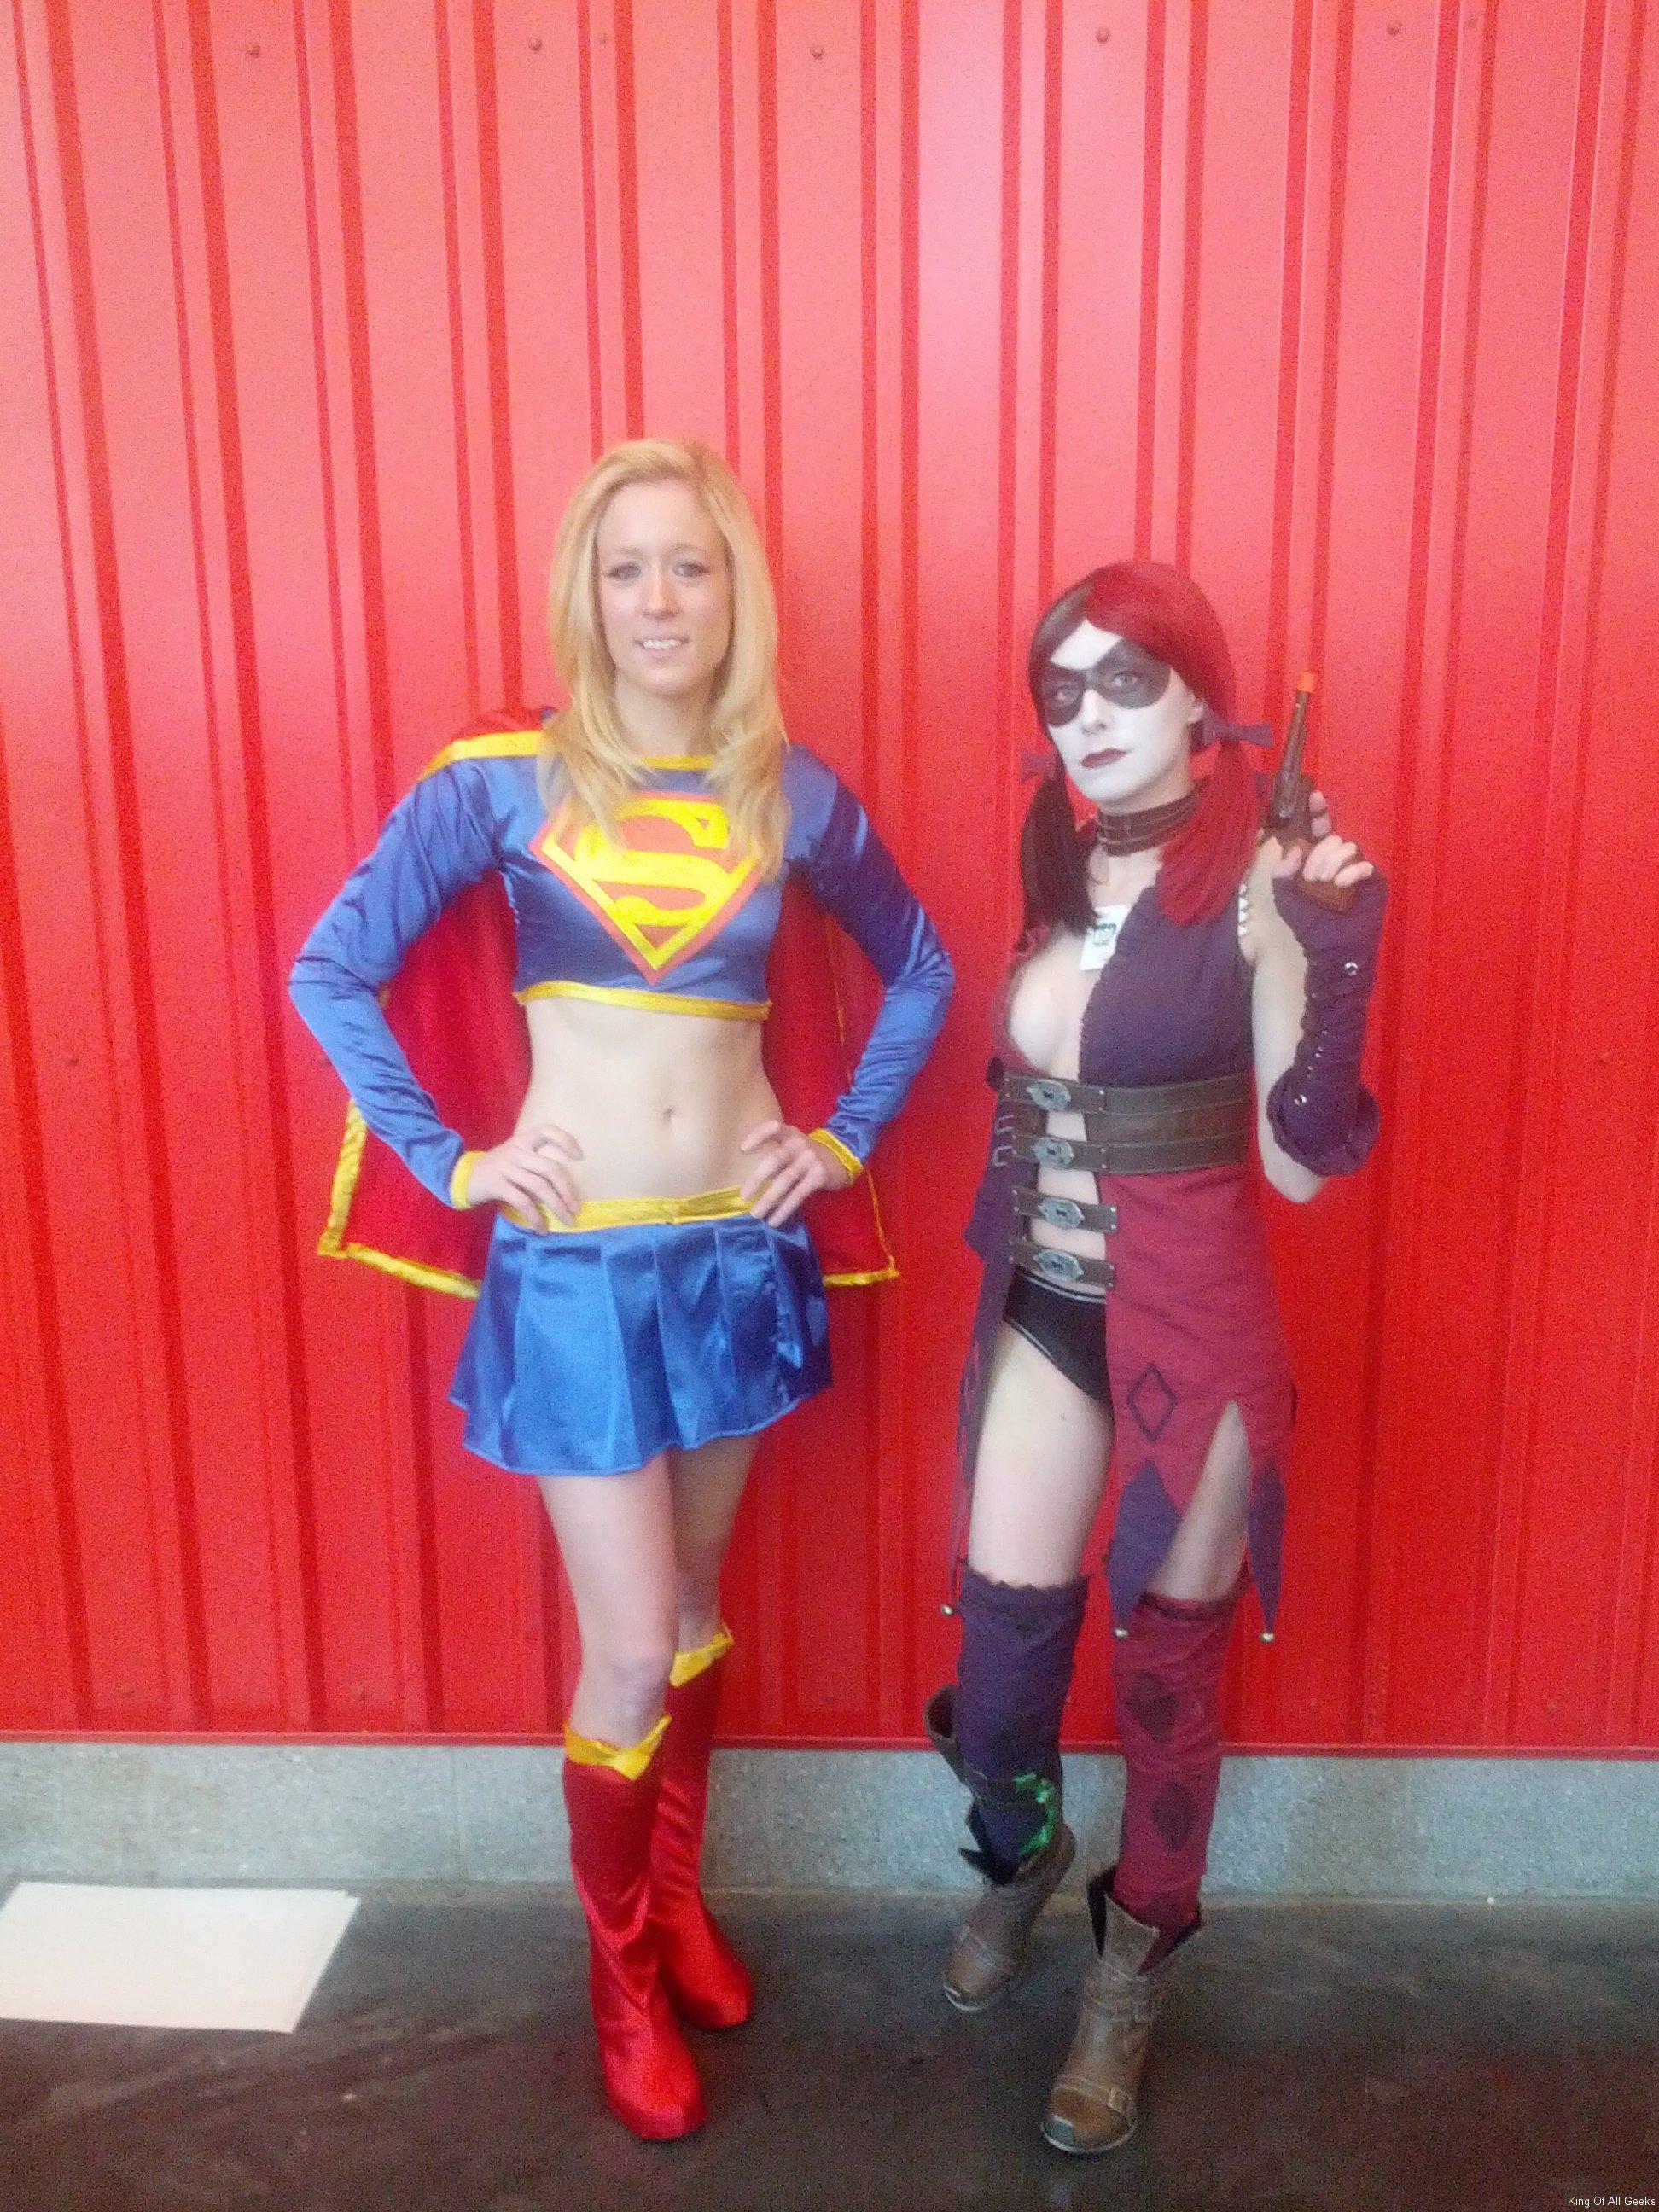 supergirl-harley-quinn-nycc-2012